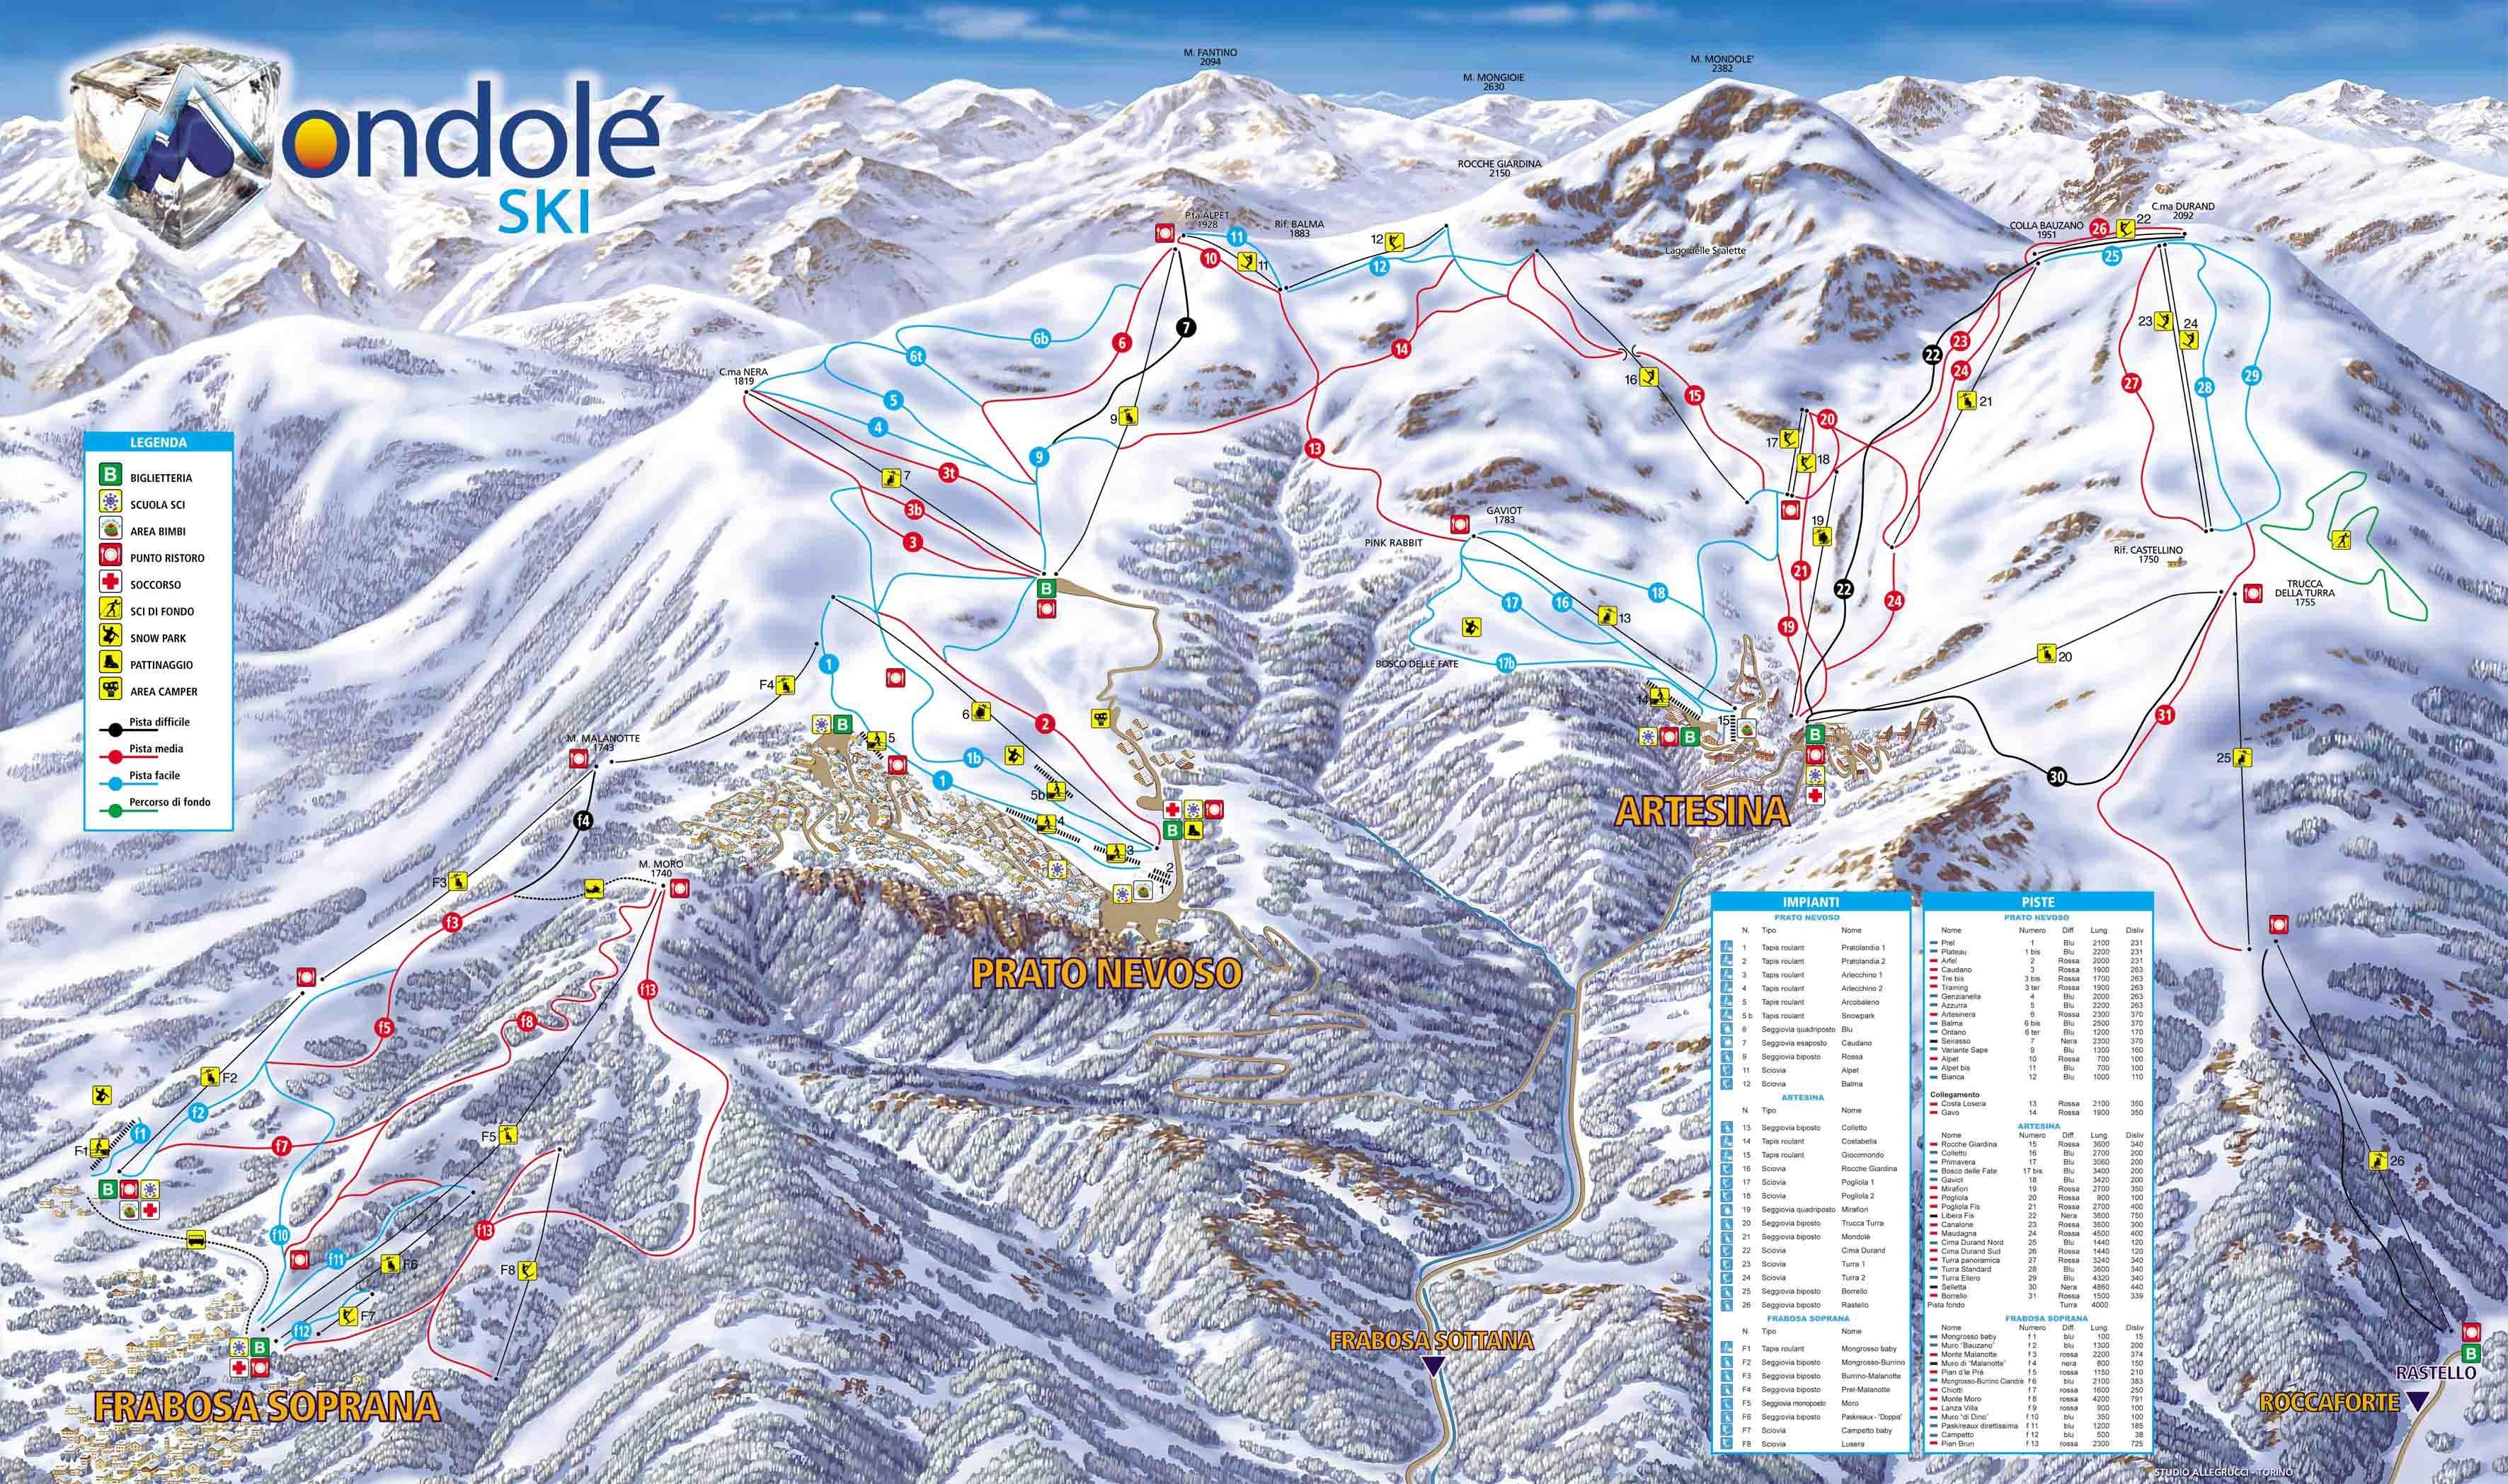 Prato Nevoso Mondol Ski Trail Map OnTheSnow